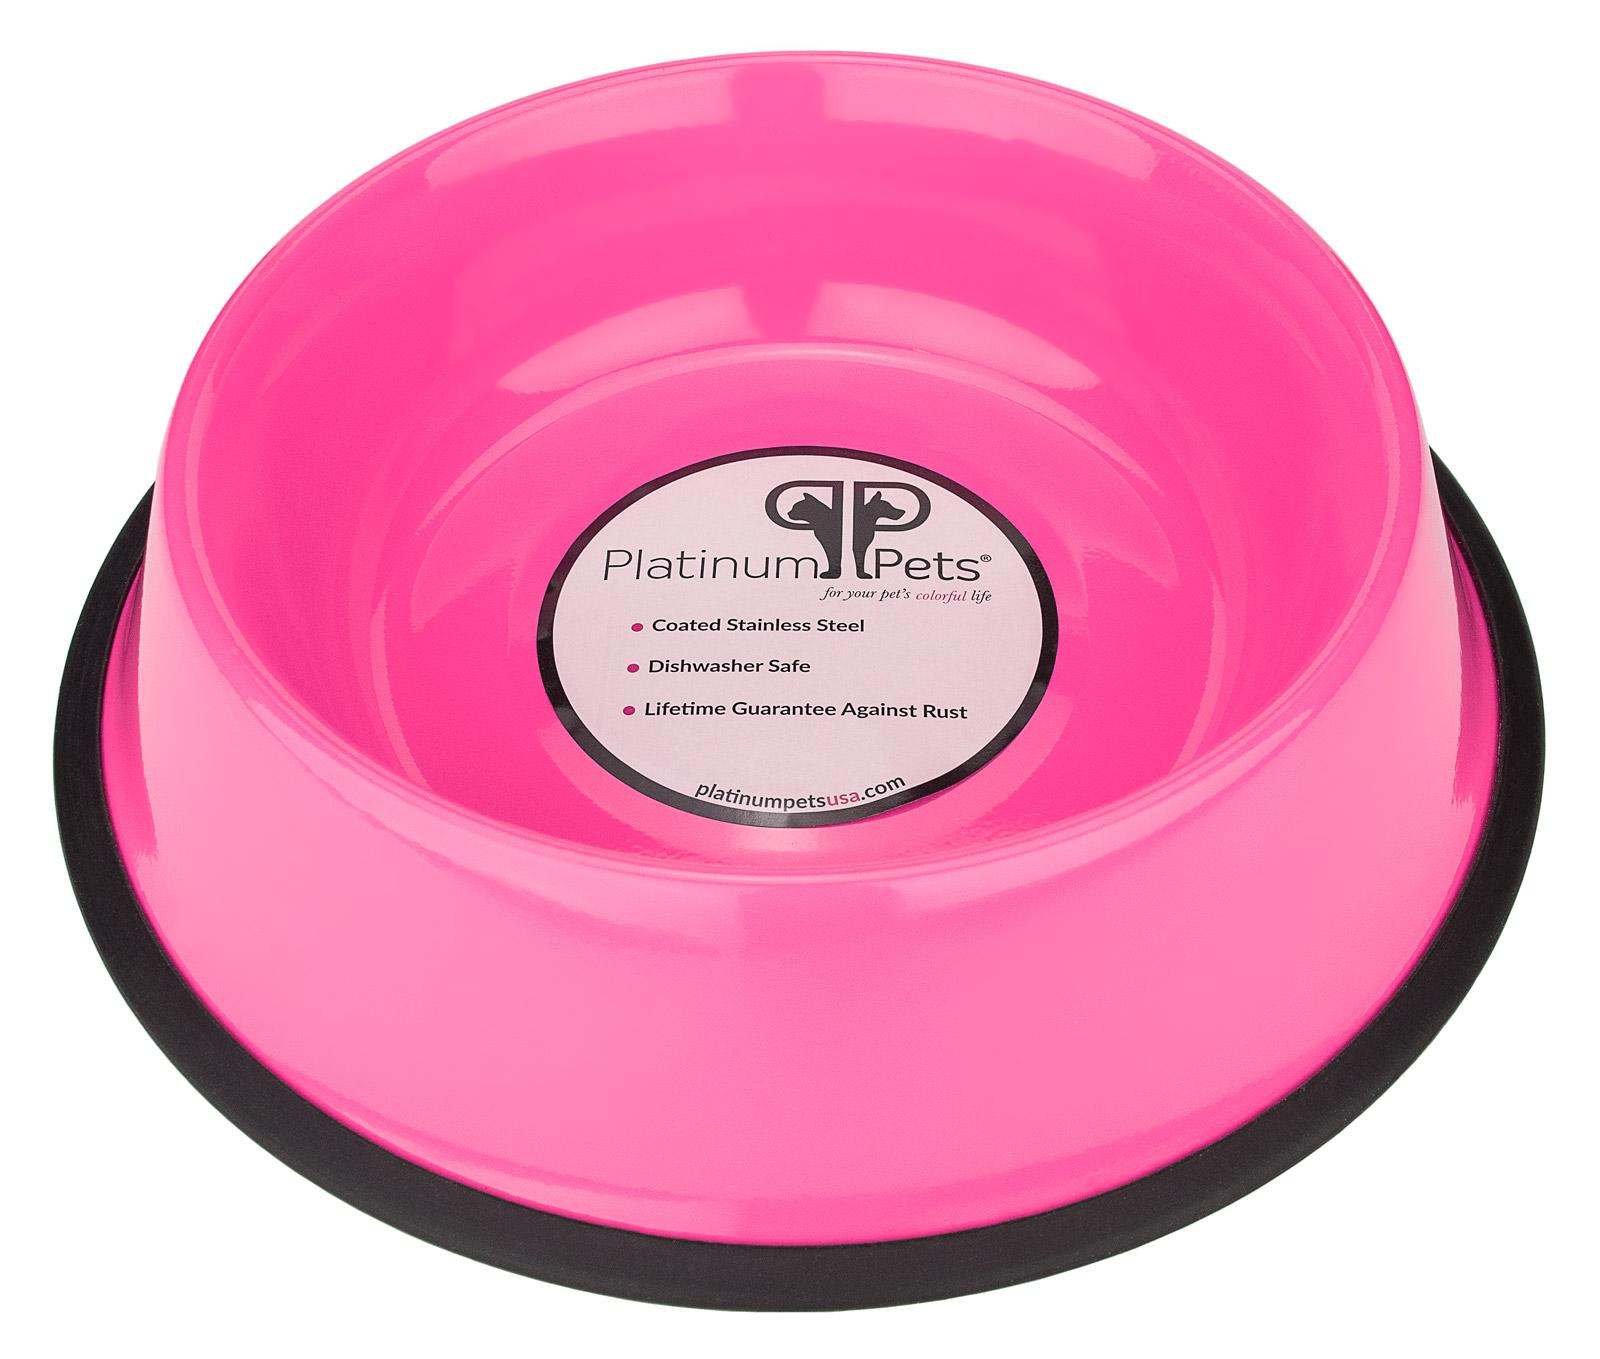 Platinum Pets® 32oz Stainless Steel Dog Bowl